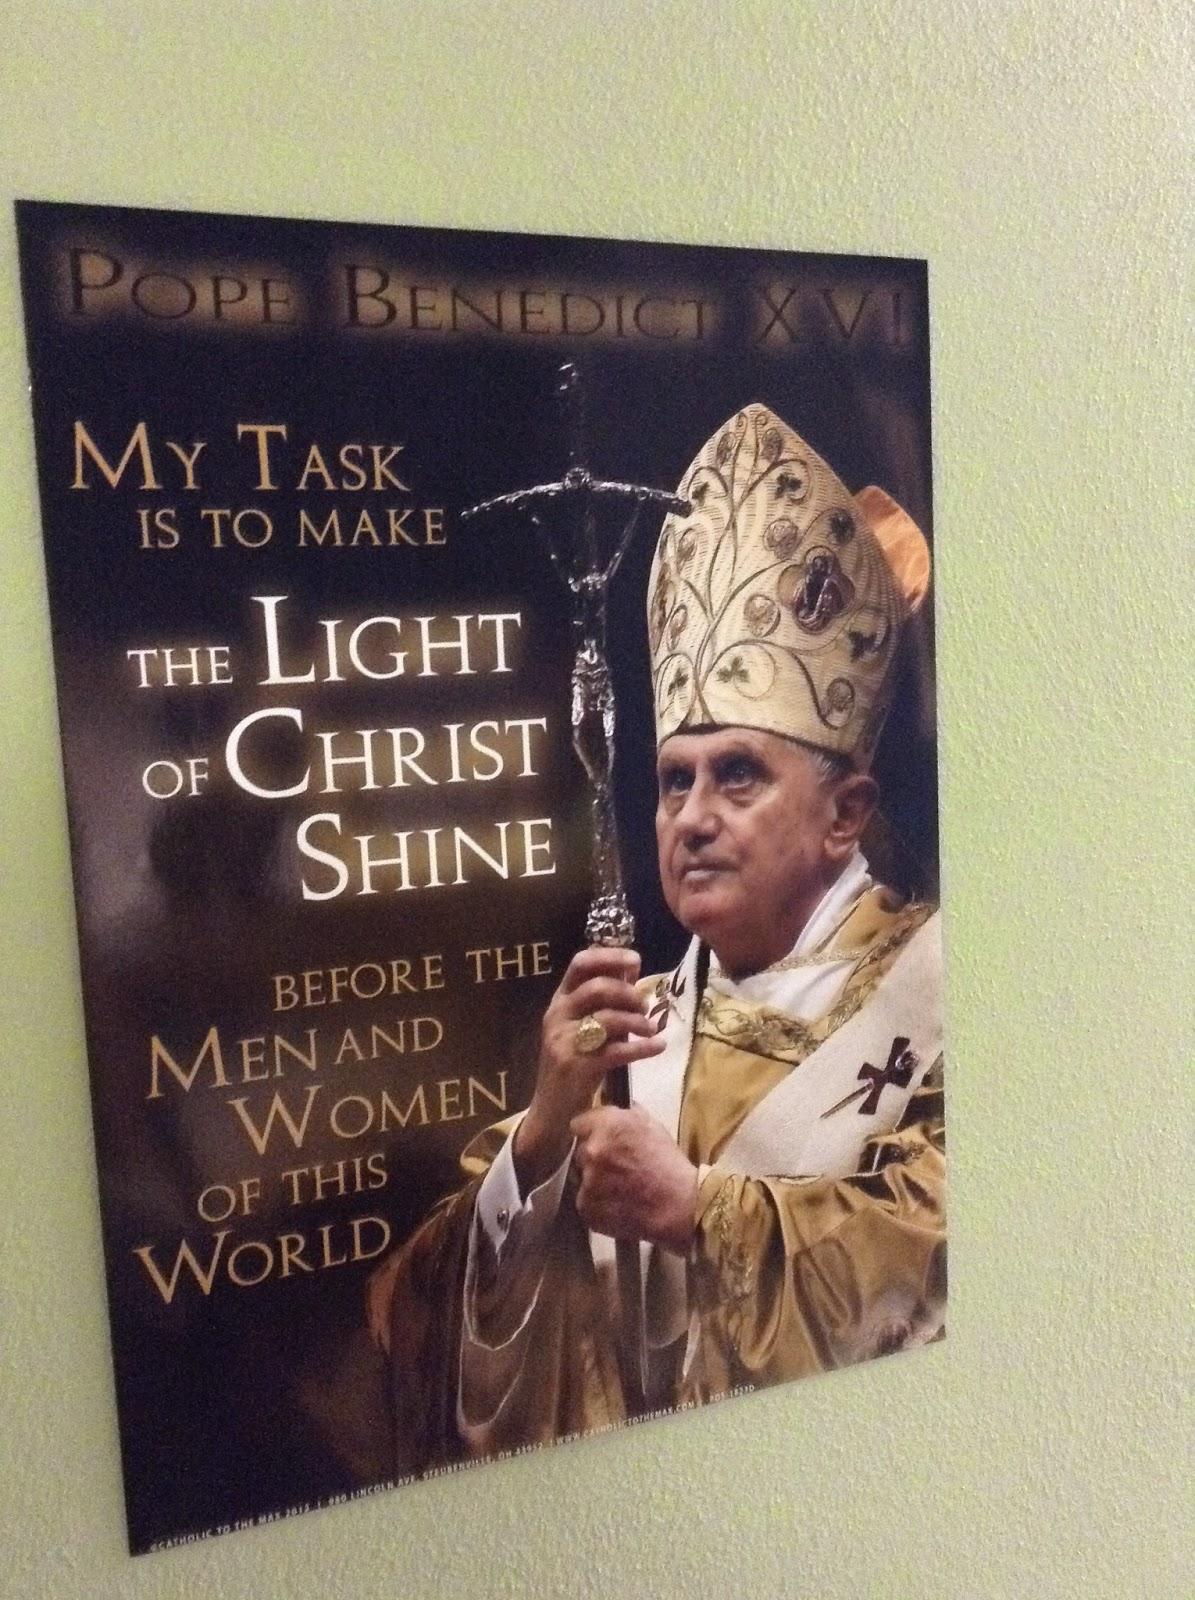 http://www.steubenvillepress.com/pope-benedict-xvi-poster/